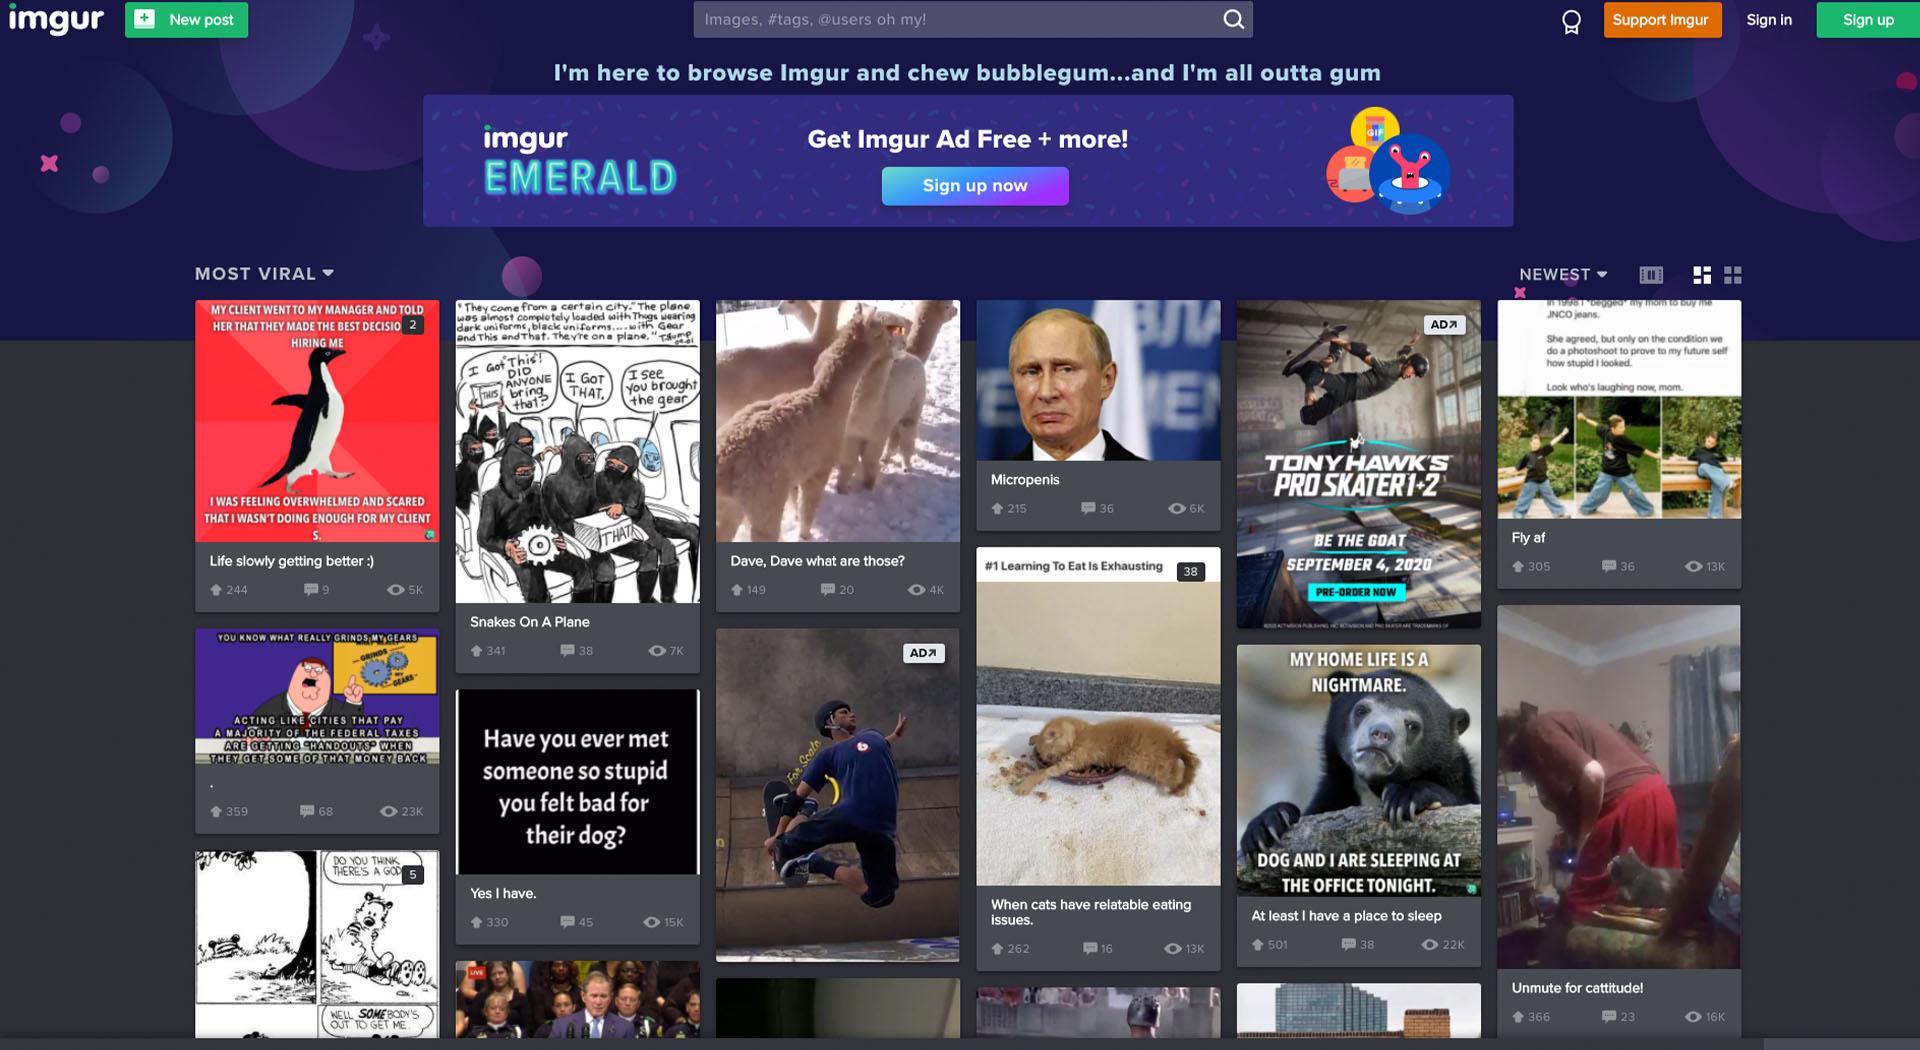 Imgur: funny websites for boredom